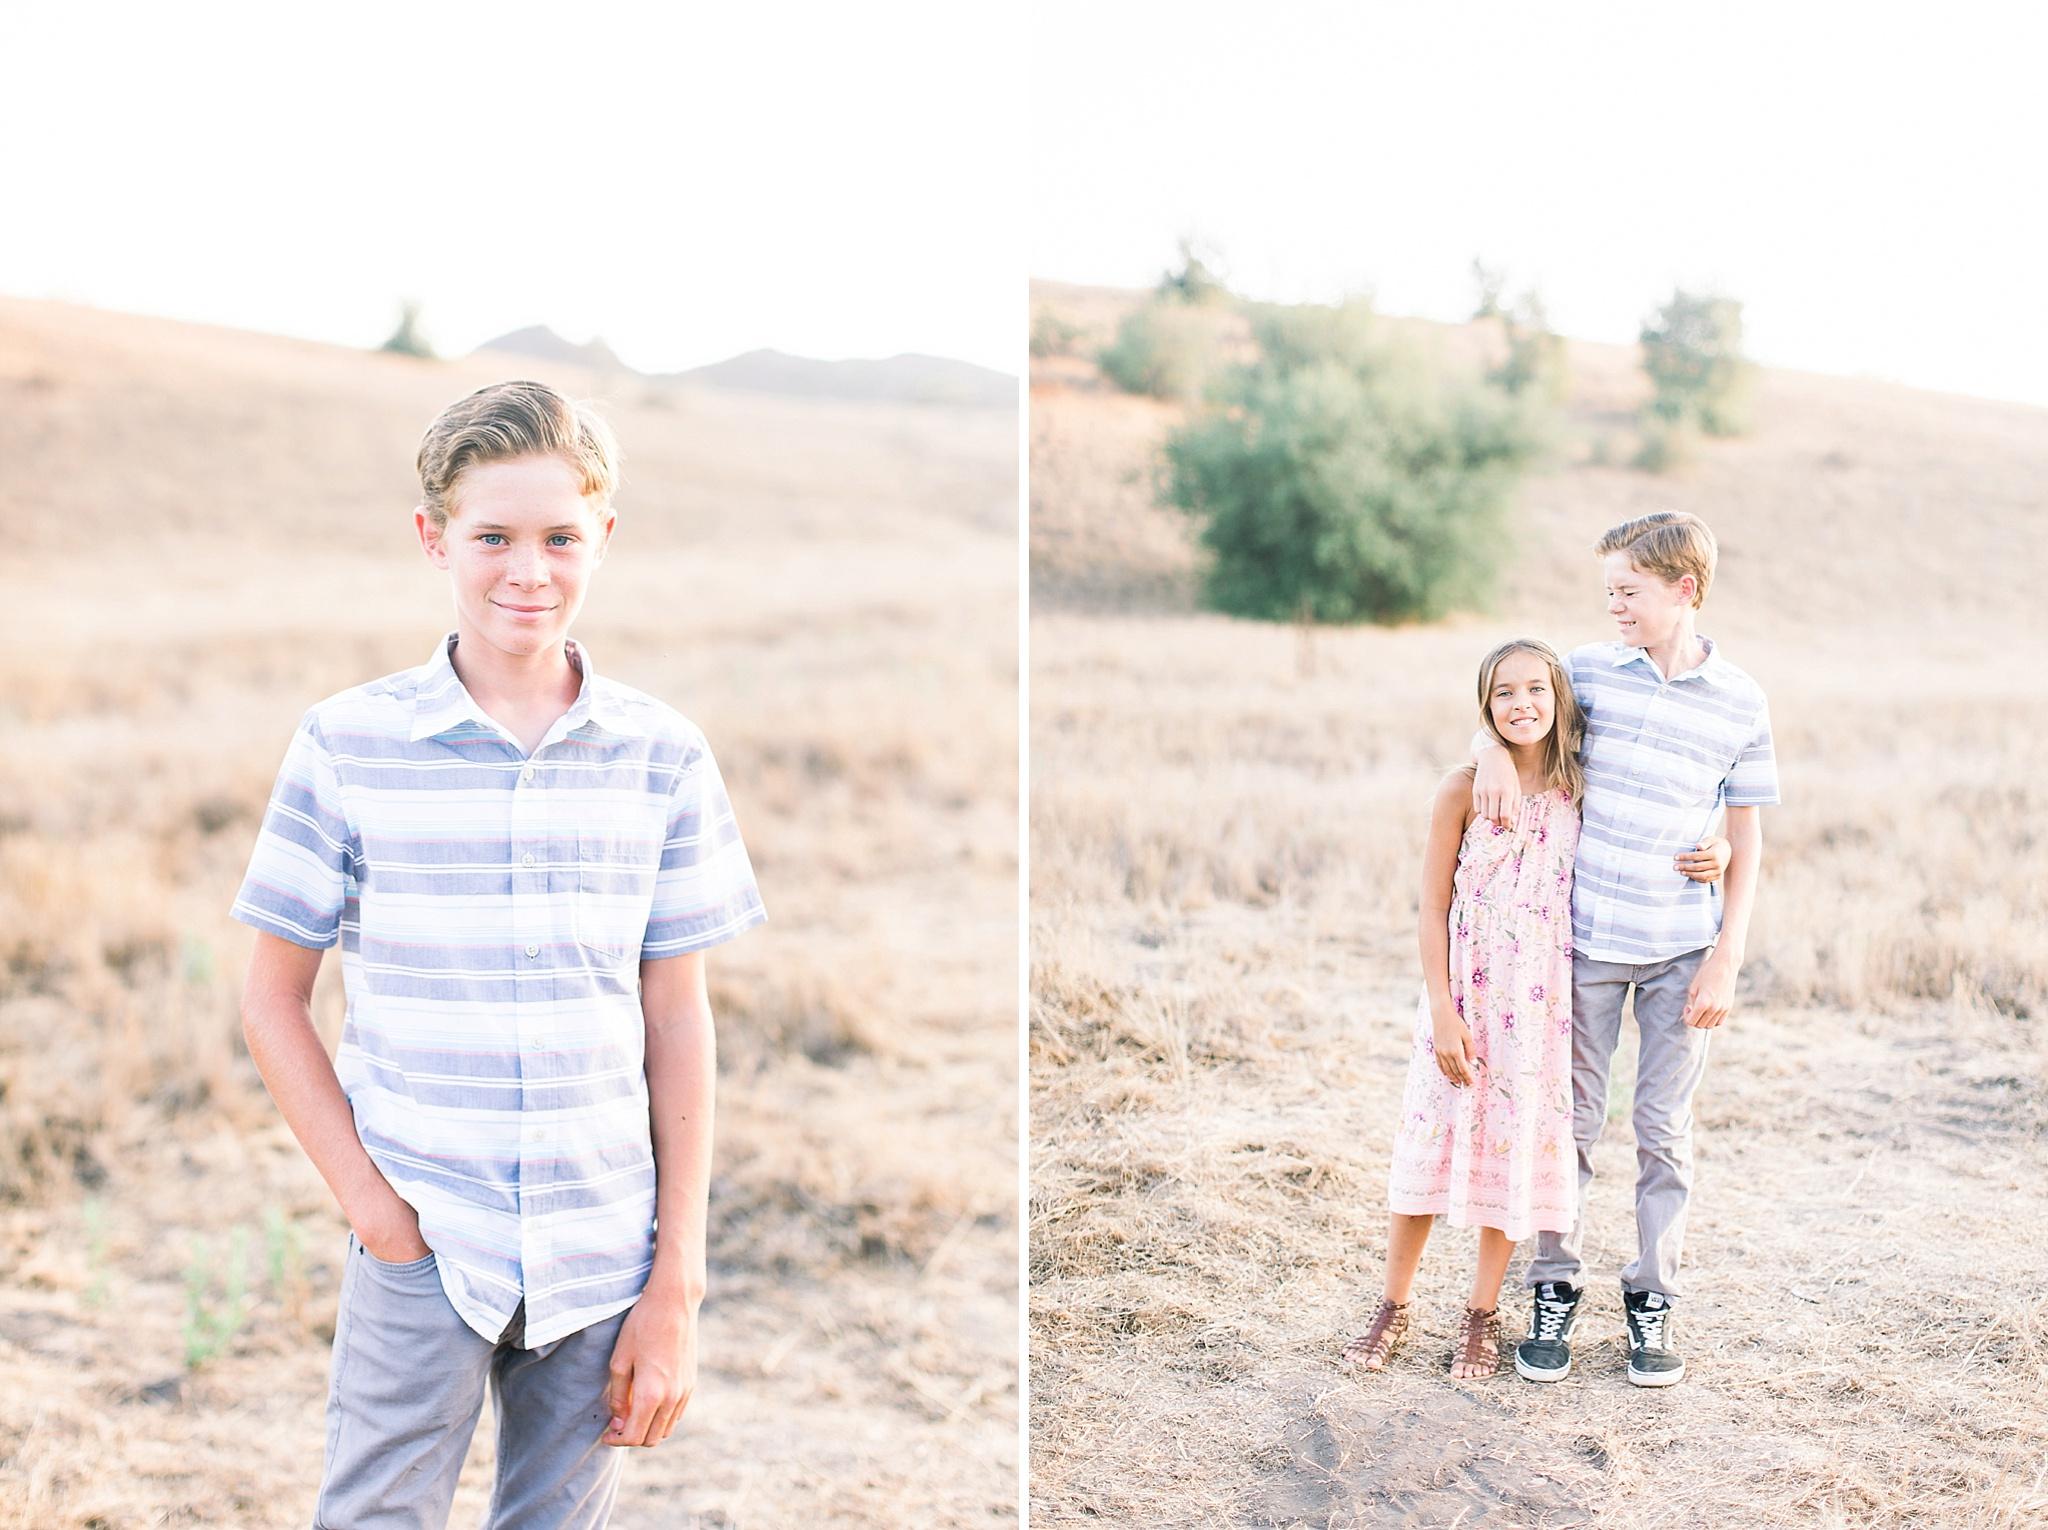 KristenLynettePhotography-KellyFamily-blog-19_WEB.jpg